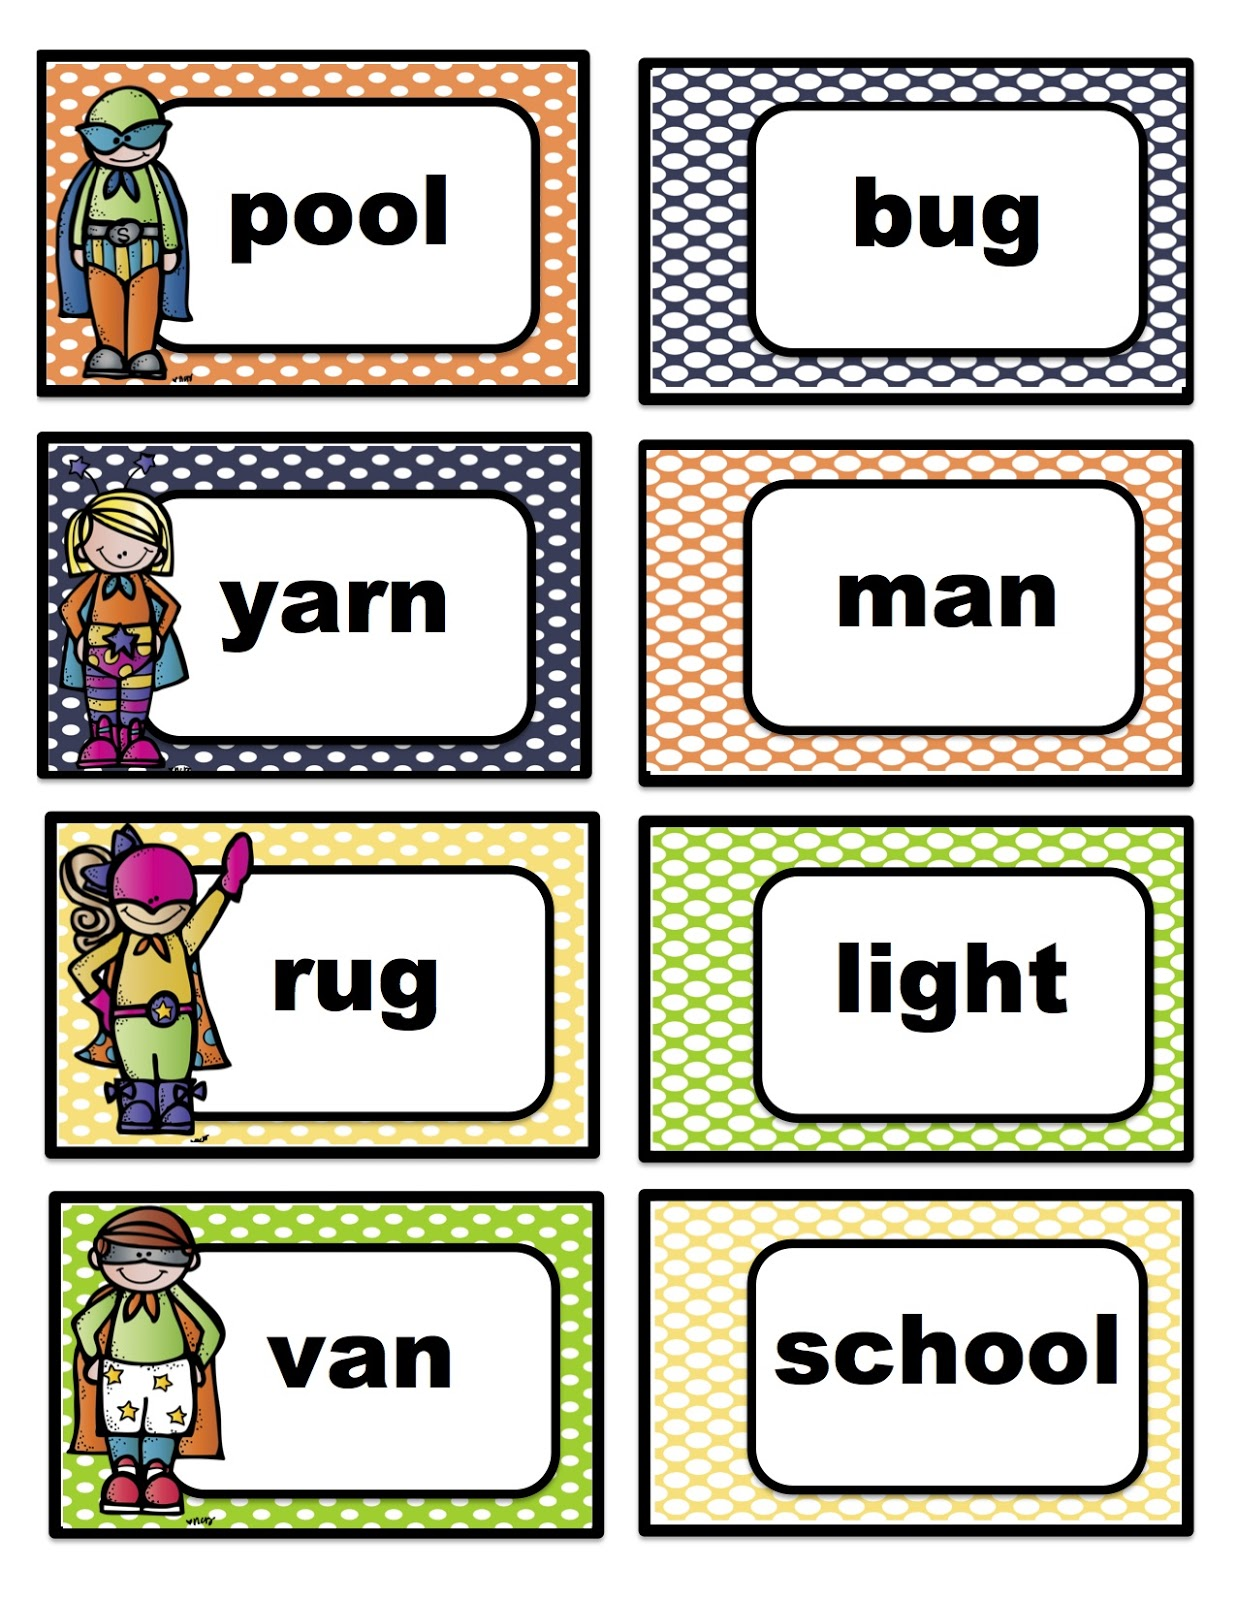 Rhym+Kinder+1 - List Of Rhyming Words For Kindergarten